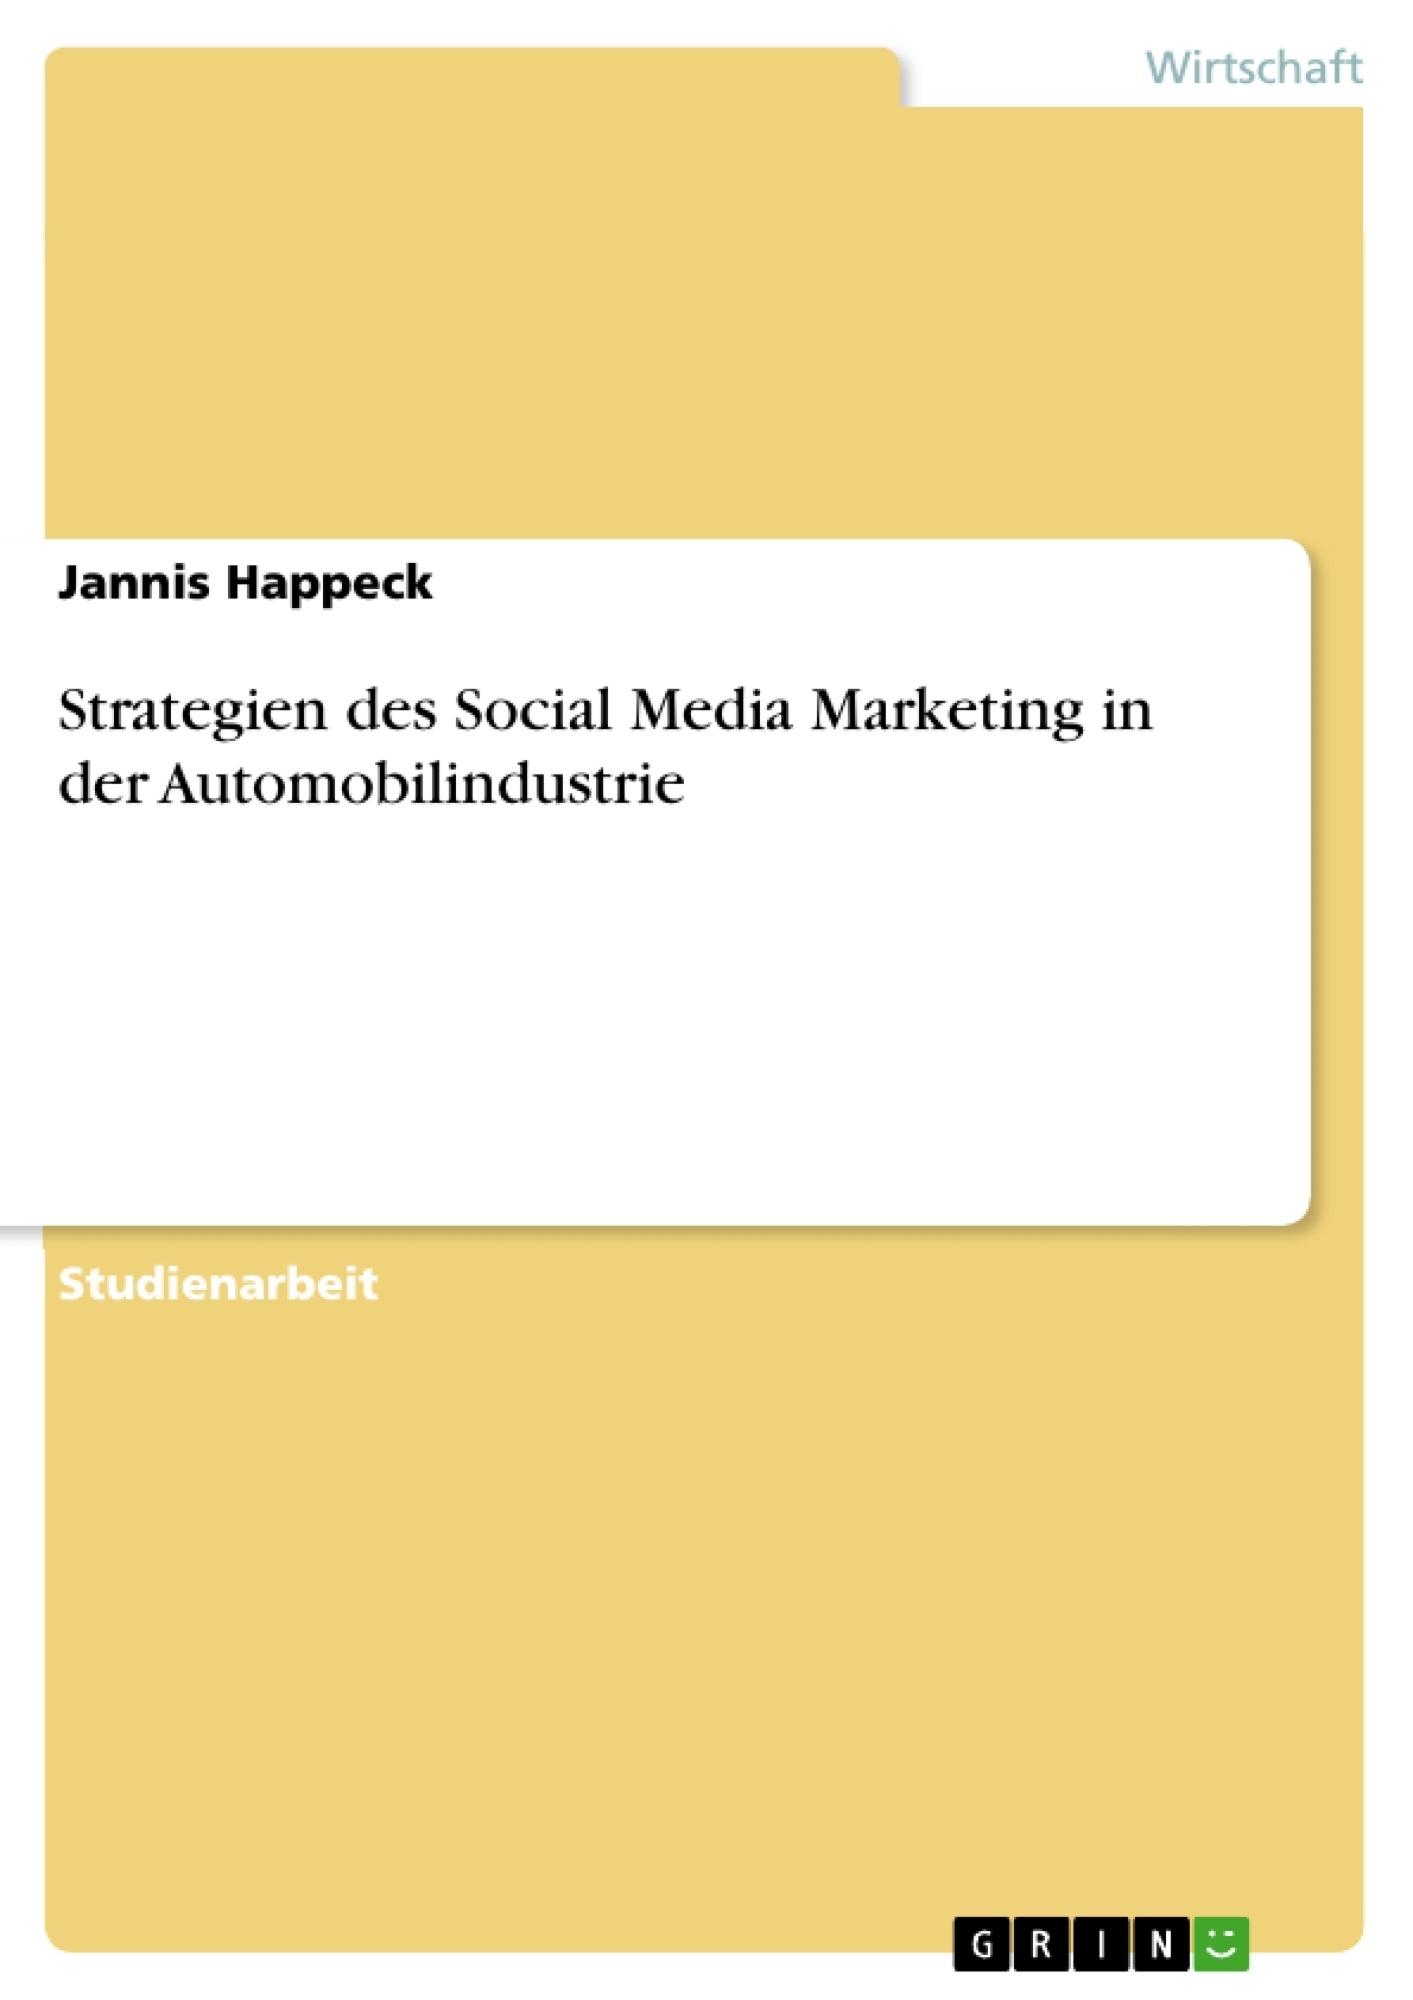 Titel: Strategien des Social Media Marketing in der Automobilindustrie